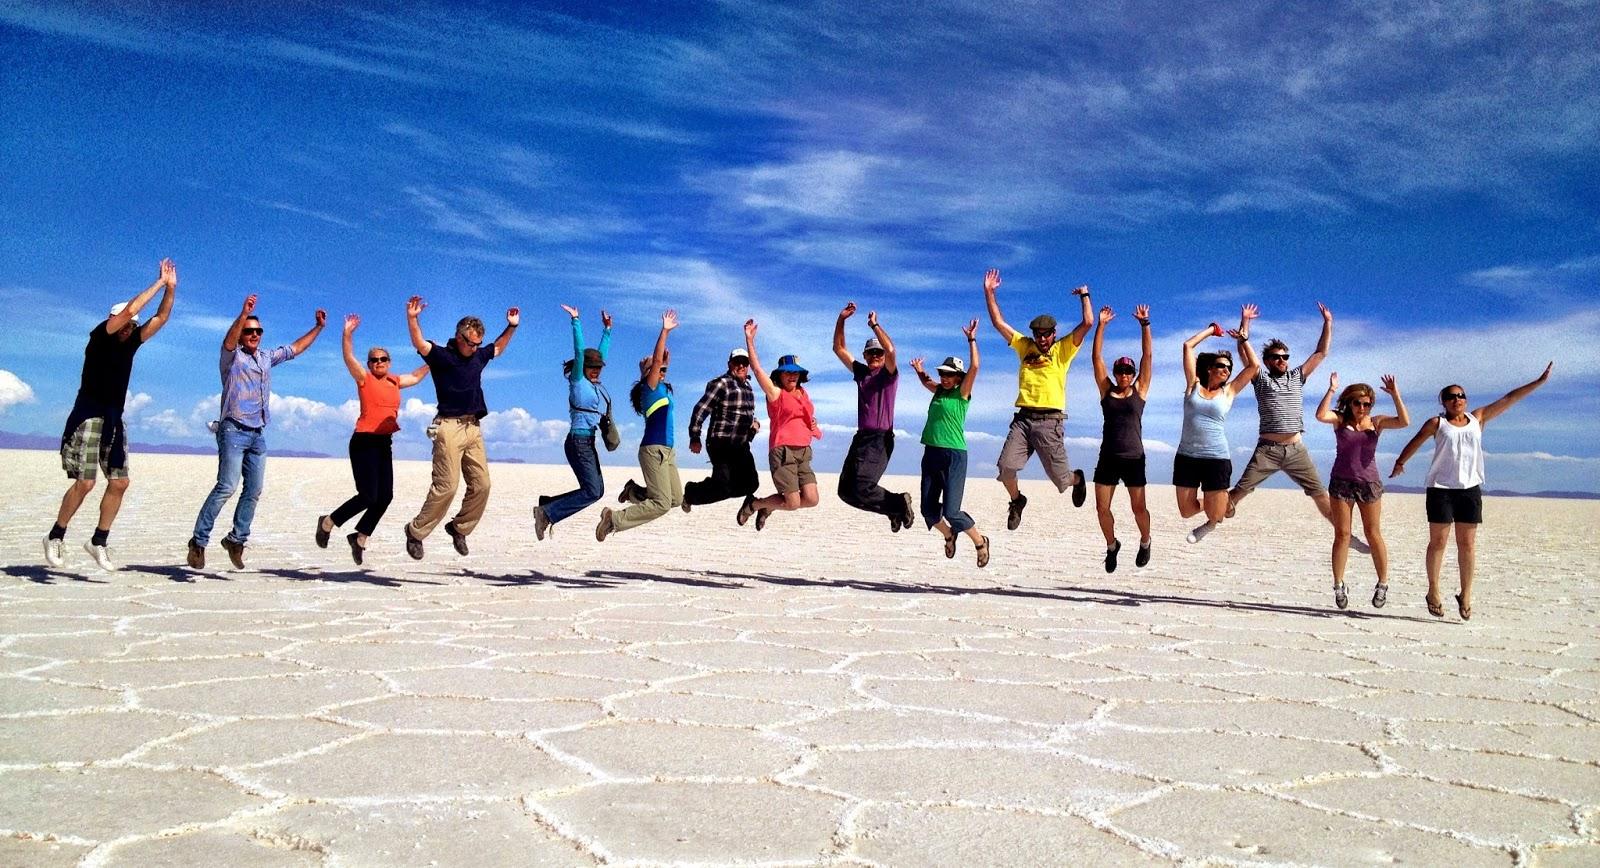 Group pic in the Salar de Uyuni, Bolivia